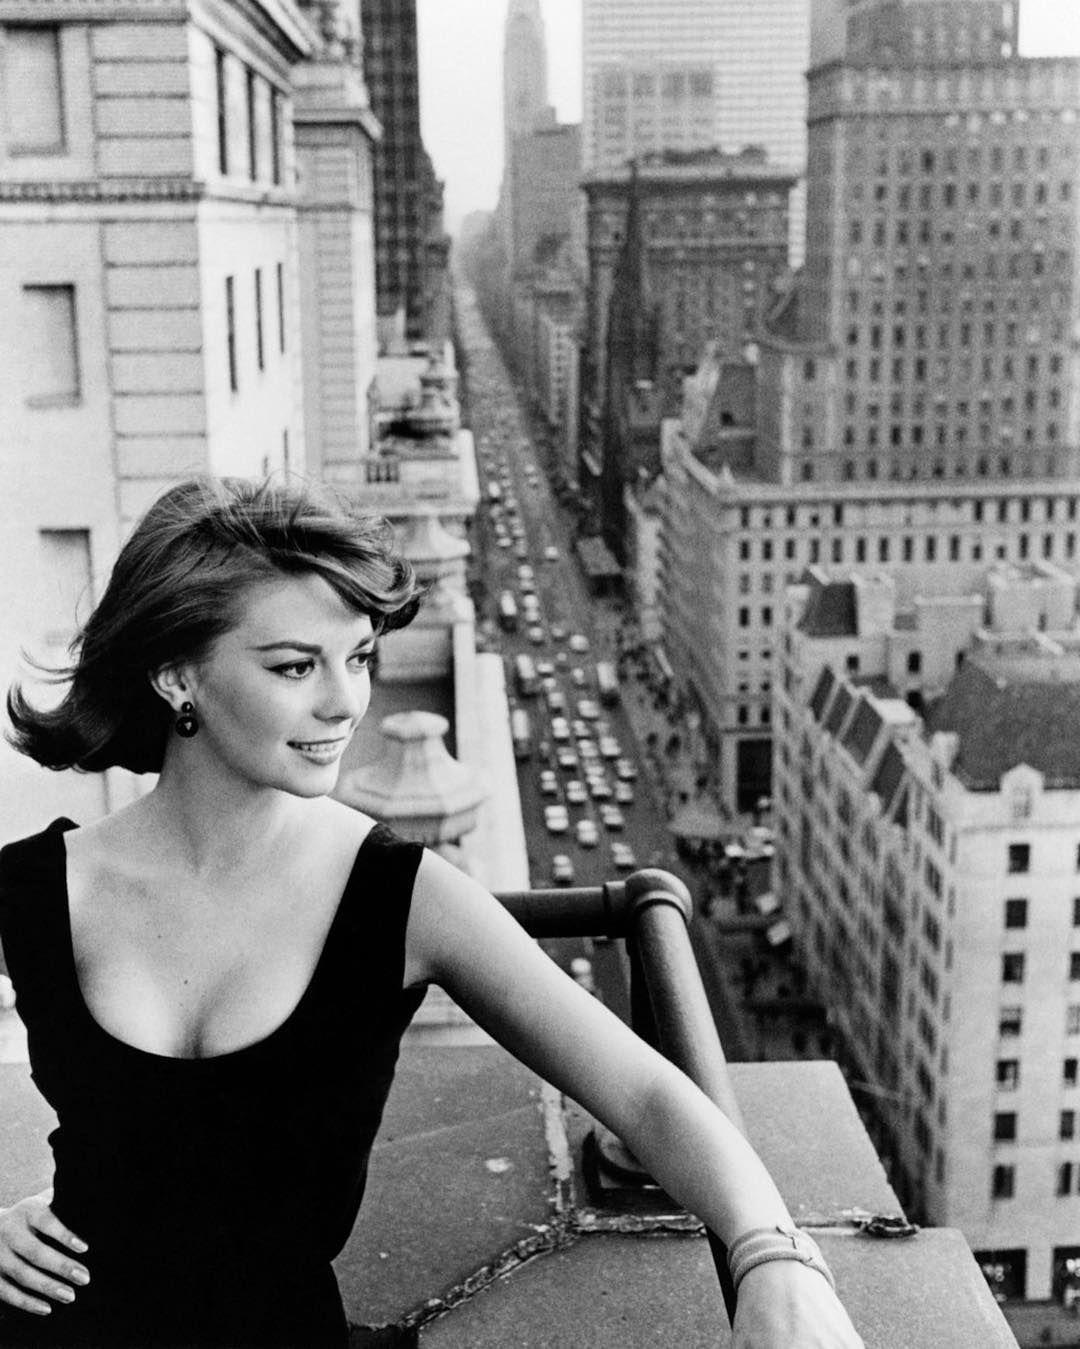 Natalie Wood 1960s Vintage Vintagestyle